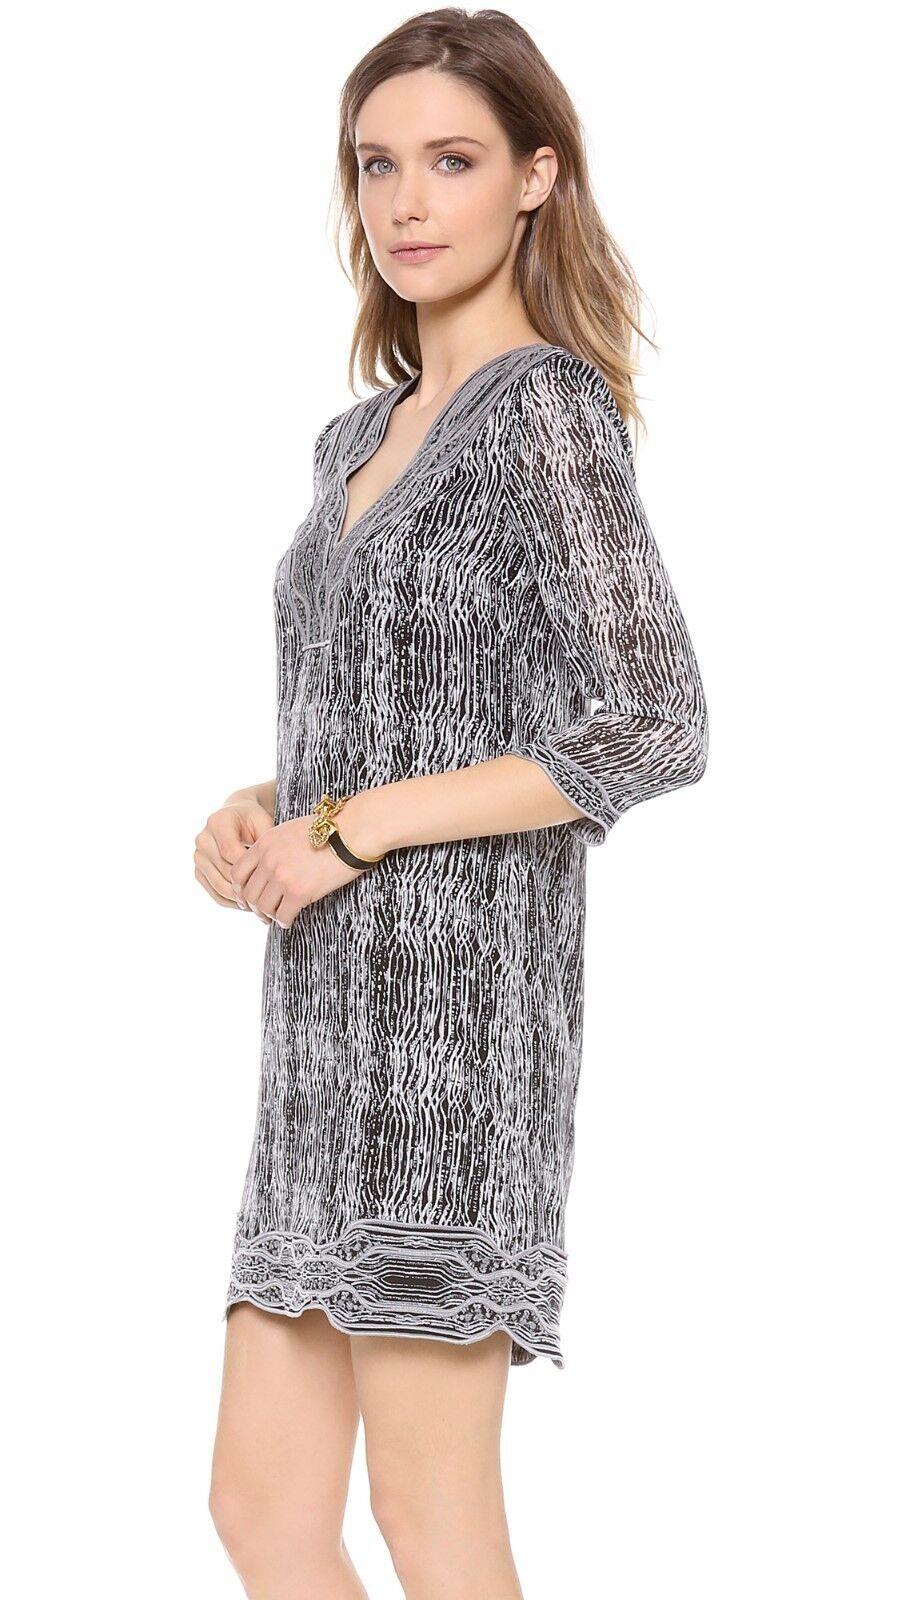 Diane von Furstenberg 'Lexie' Woven Woven Woven Silk Dress  ( size 2) bea856